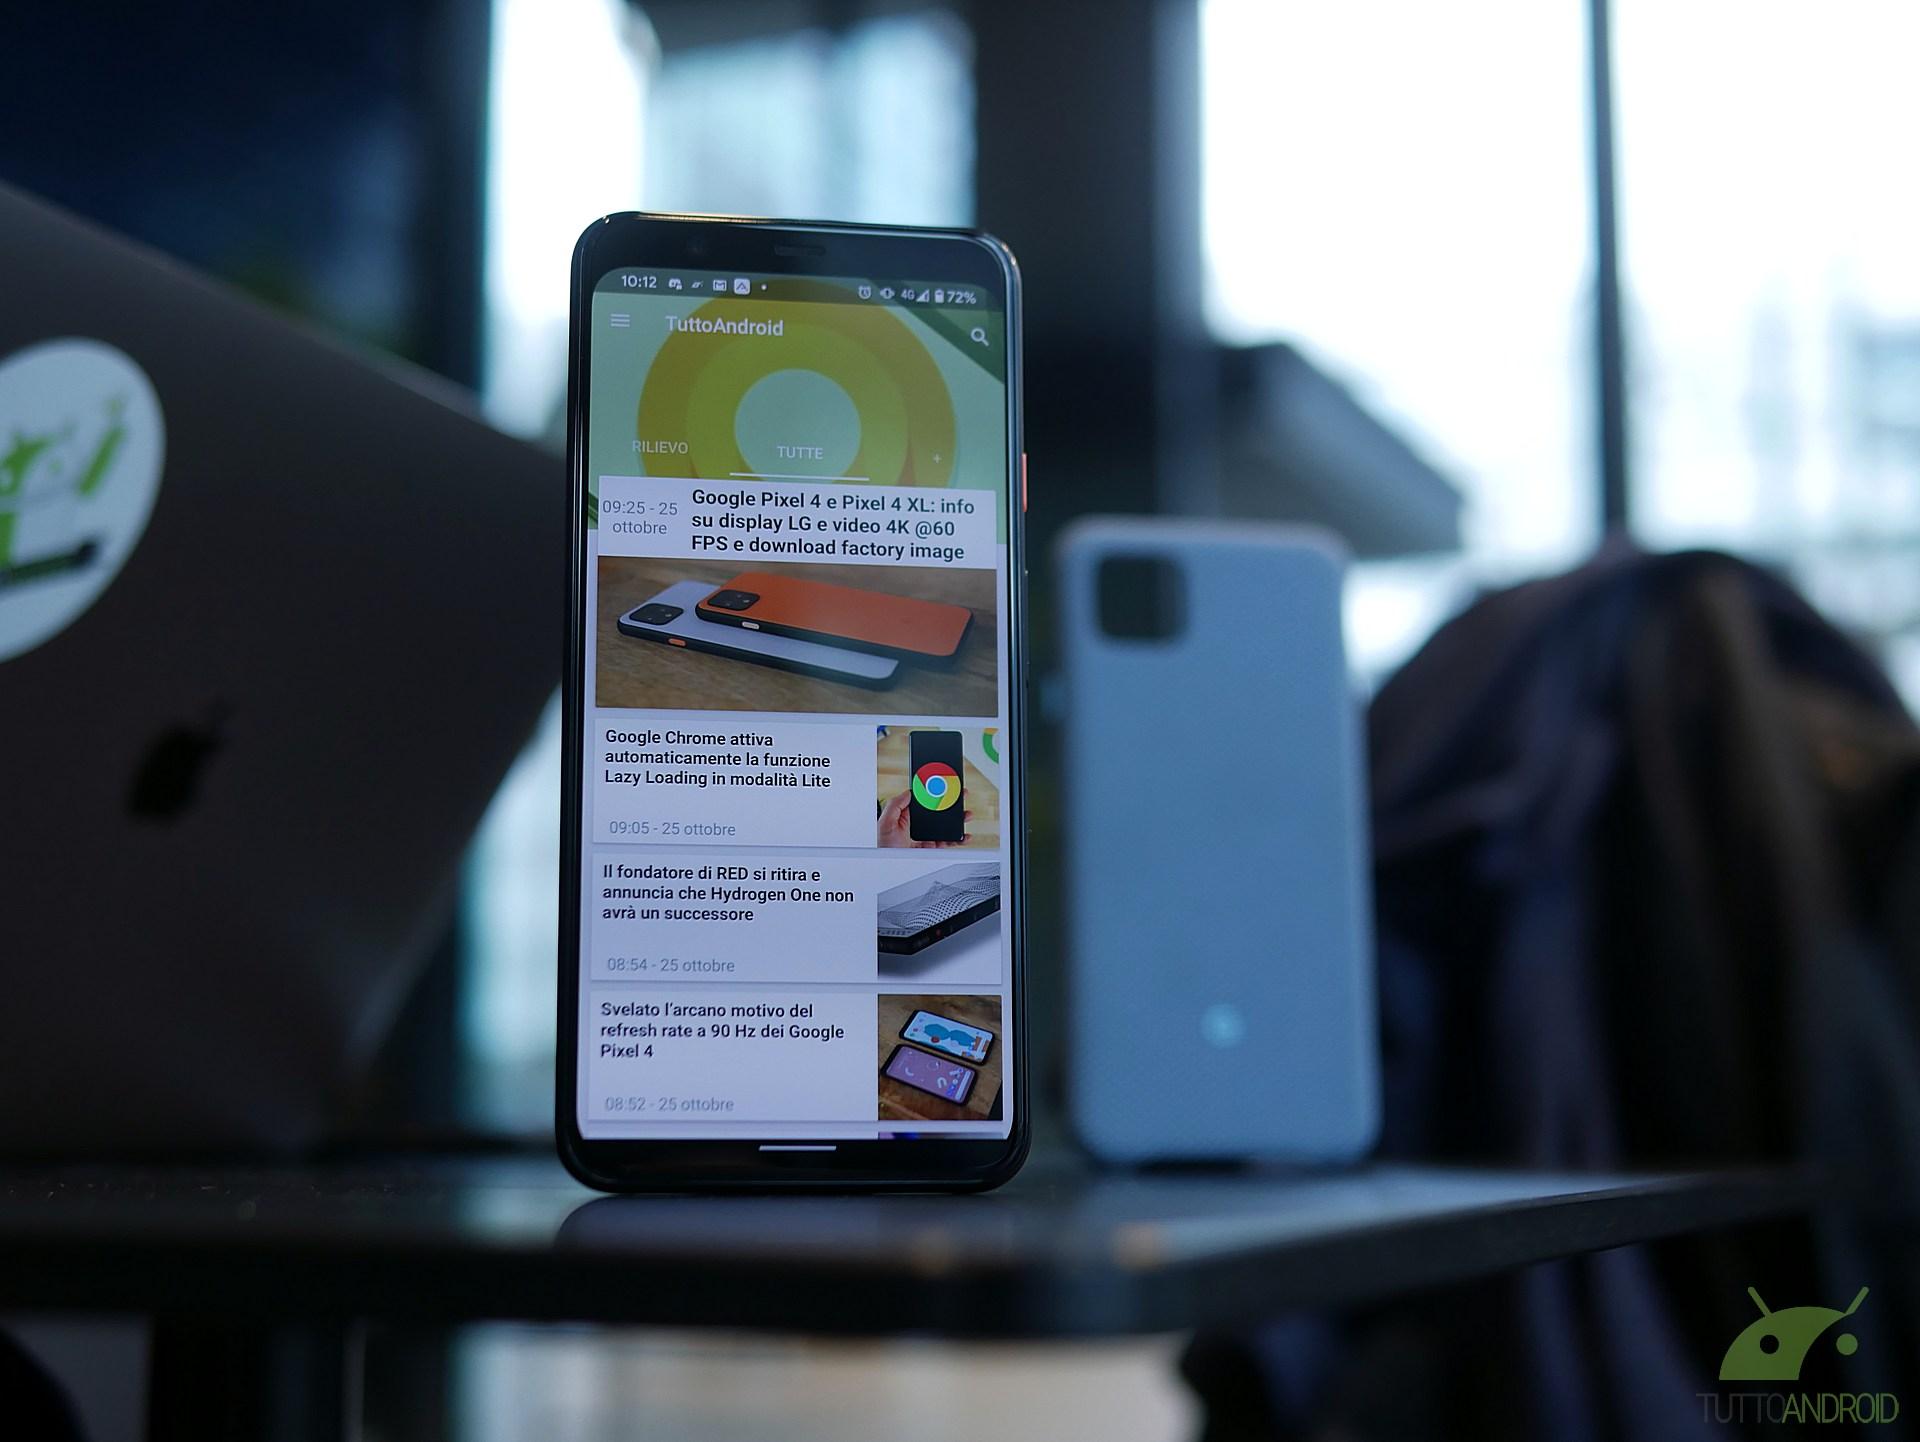 Il noioso sfarfallio al display di Google Pixel 4 ha una sol